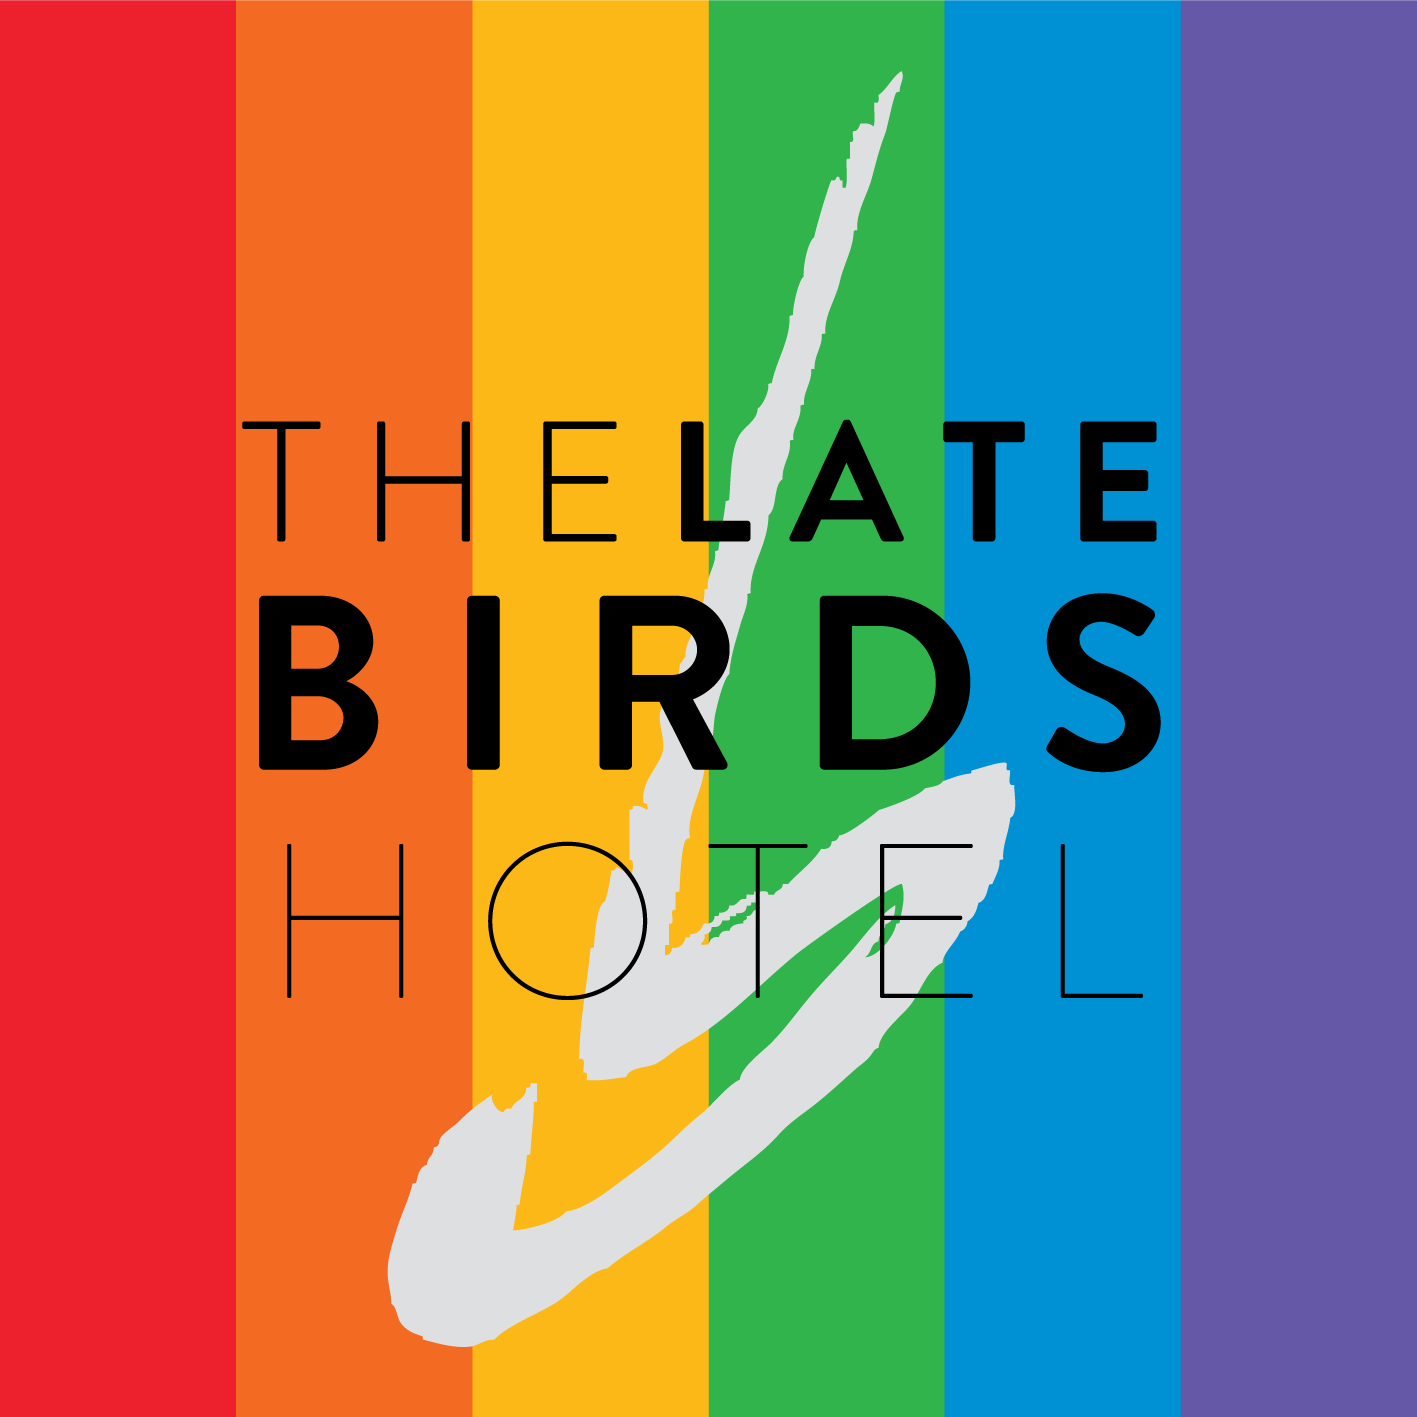 Follow the late birds on instagram -